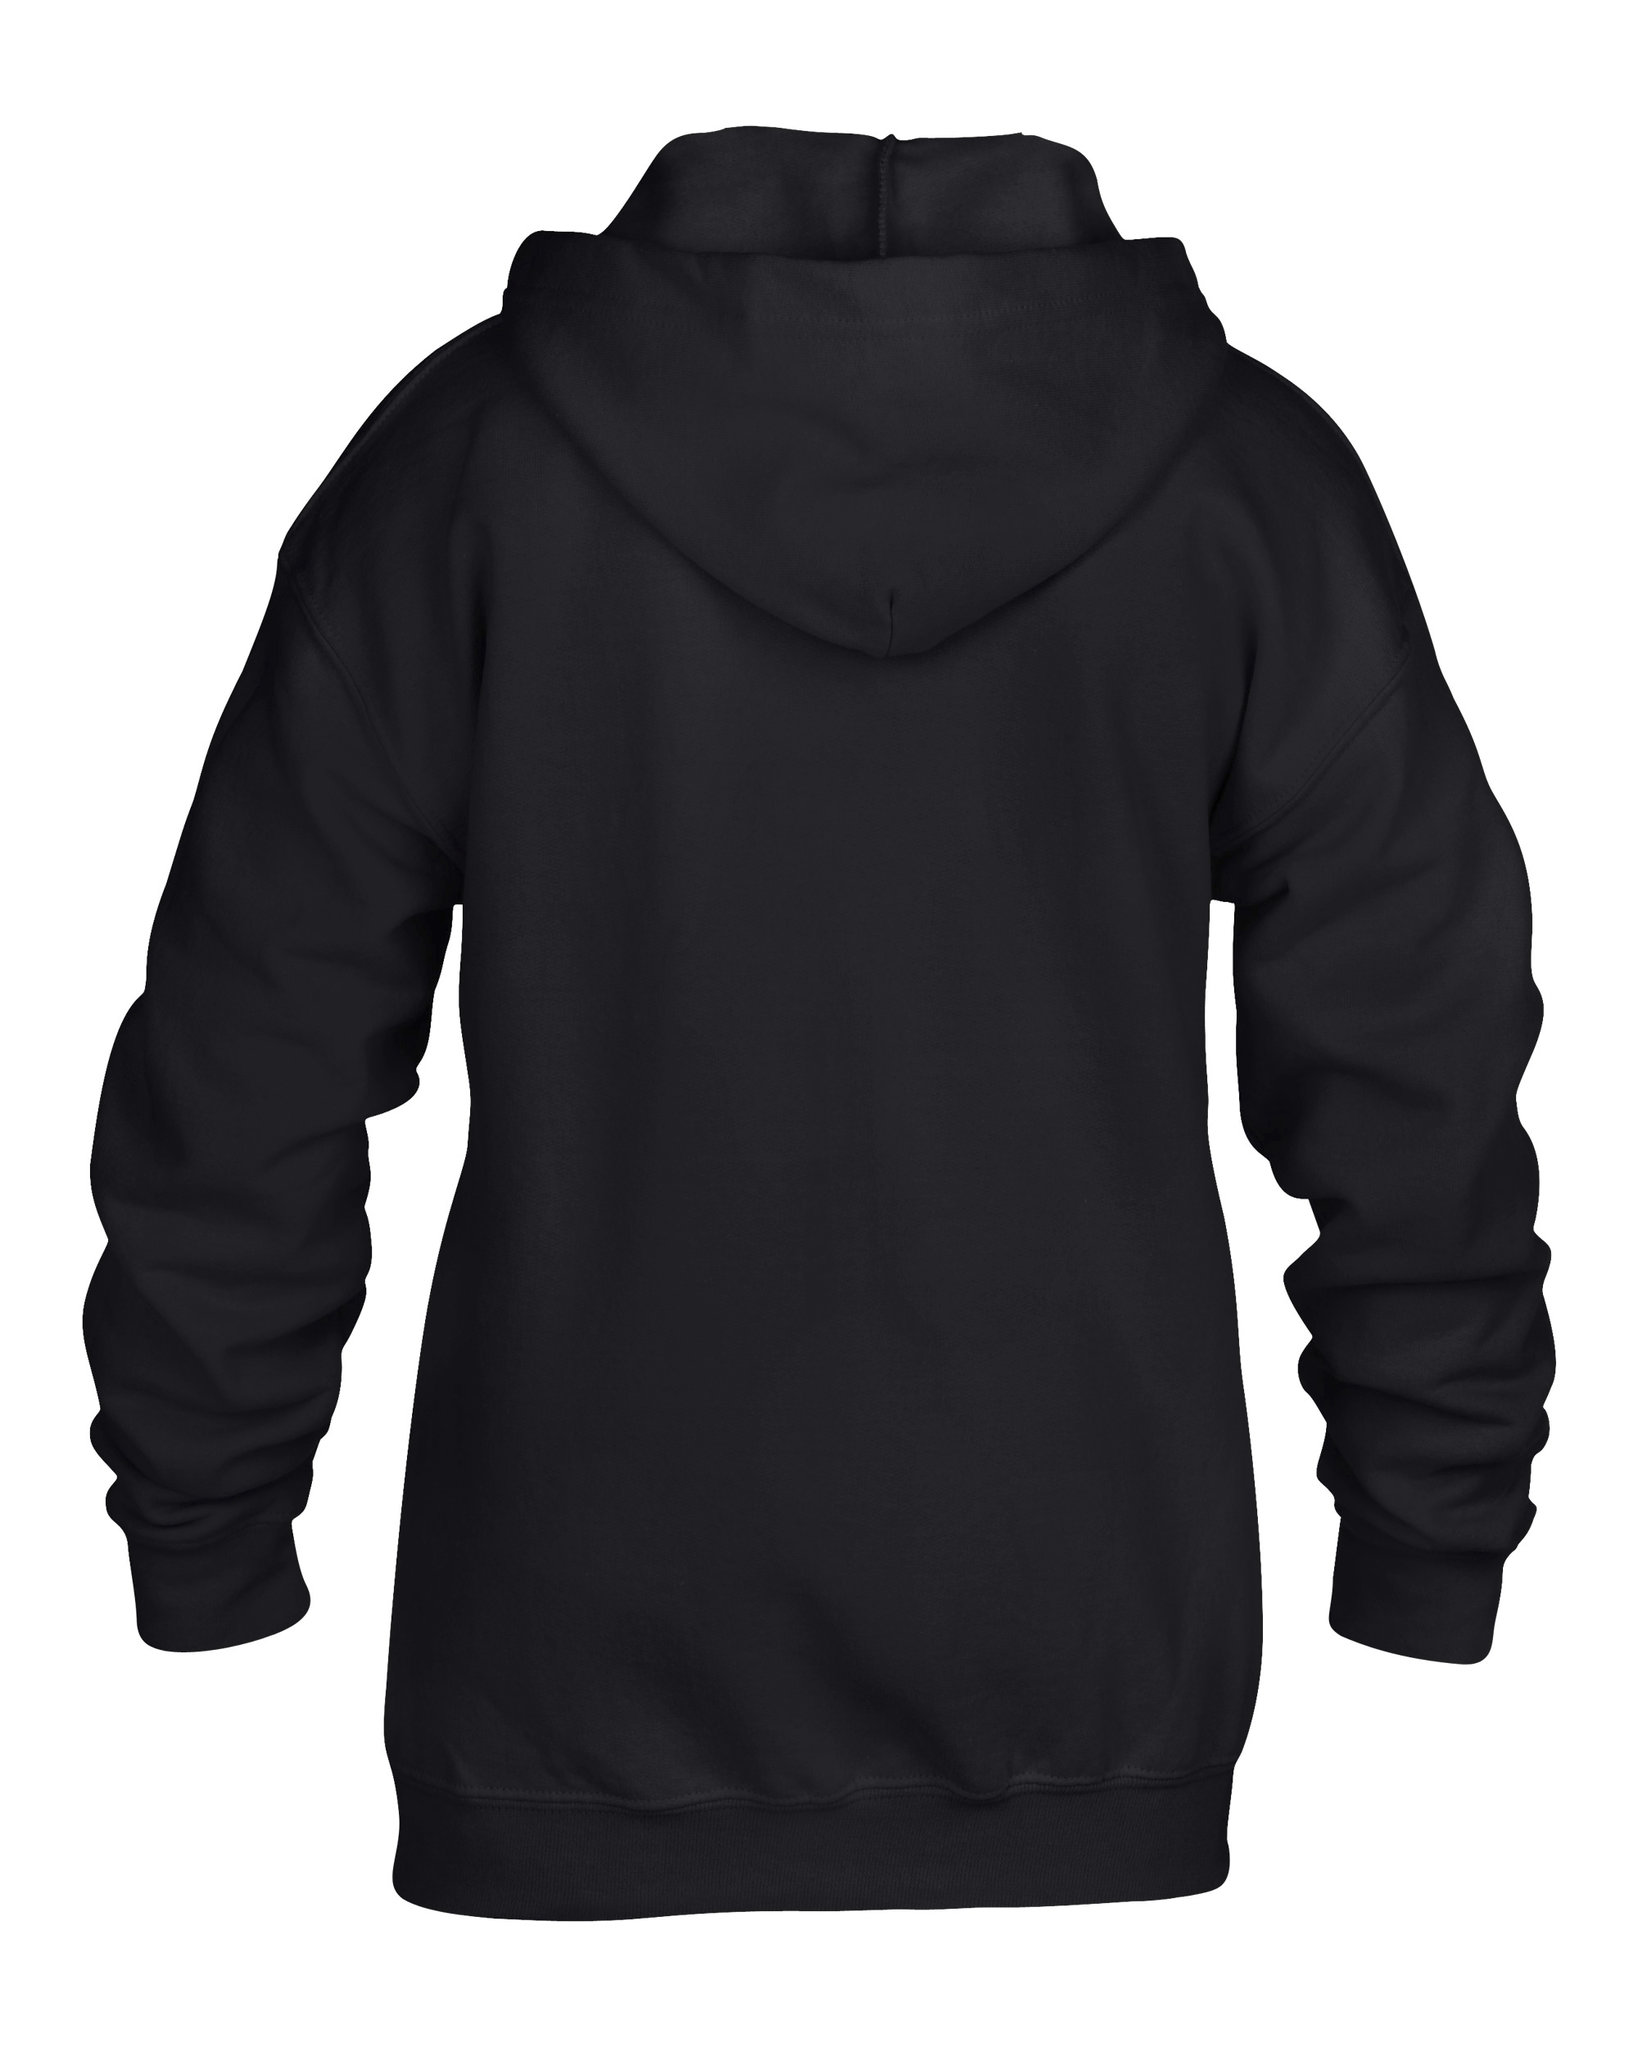 Sweatshirt publicitaire Full Hoody gris enfant - sweatshirt personnalisable